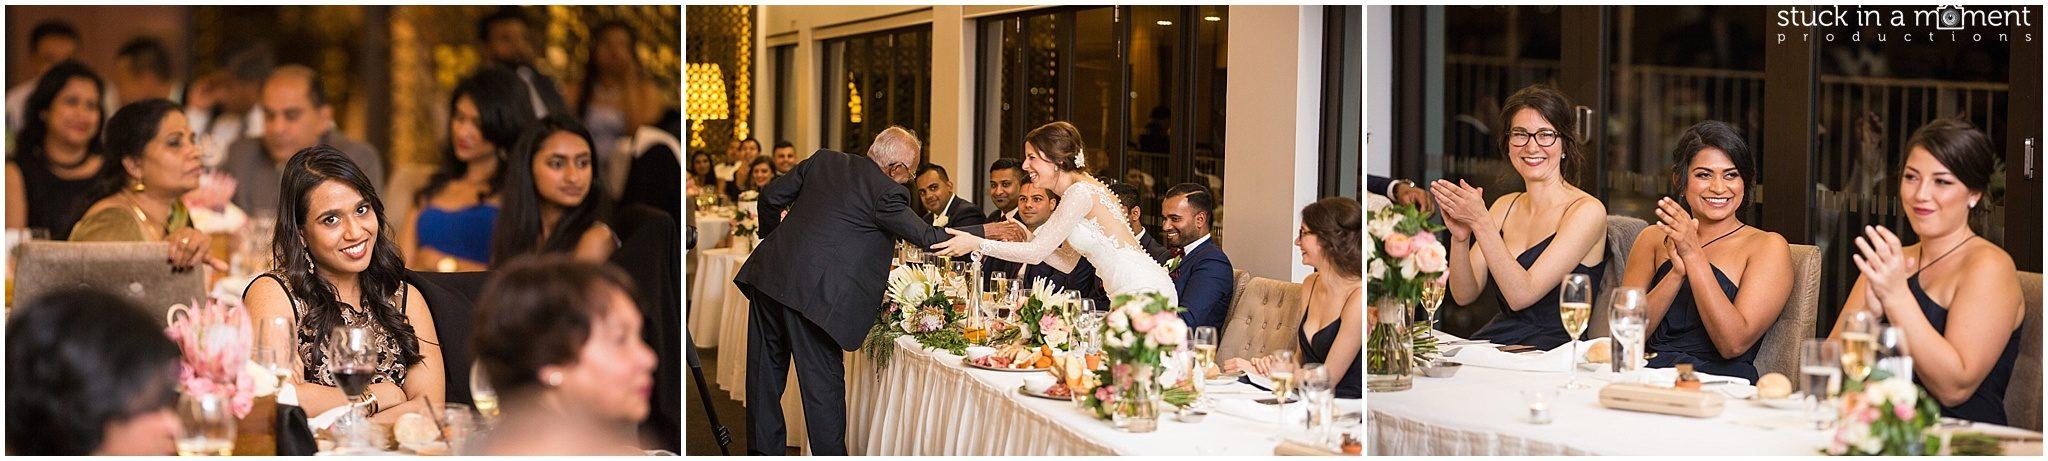 sergeants mess wedding photos